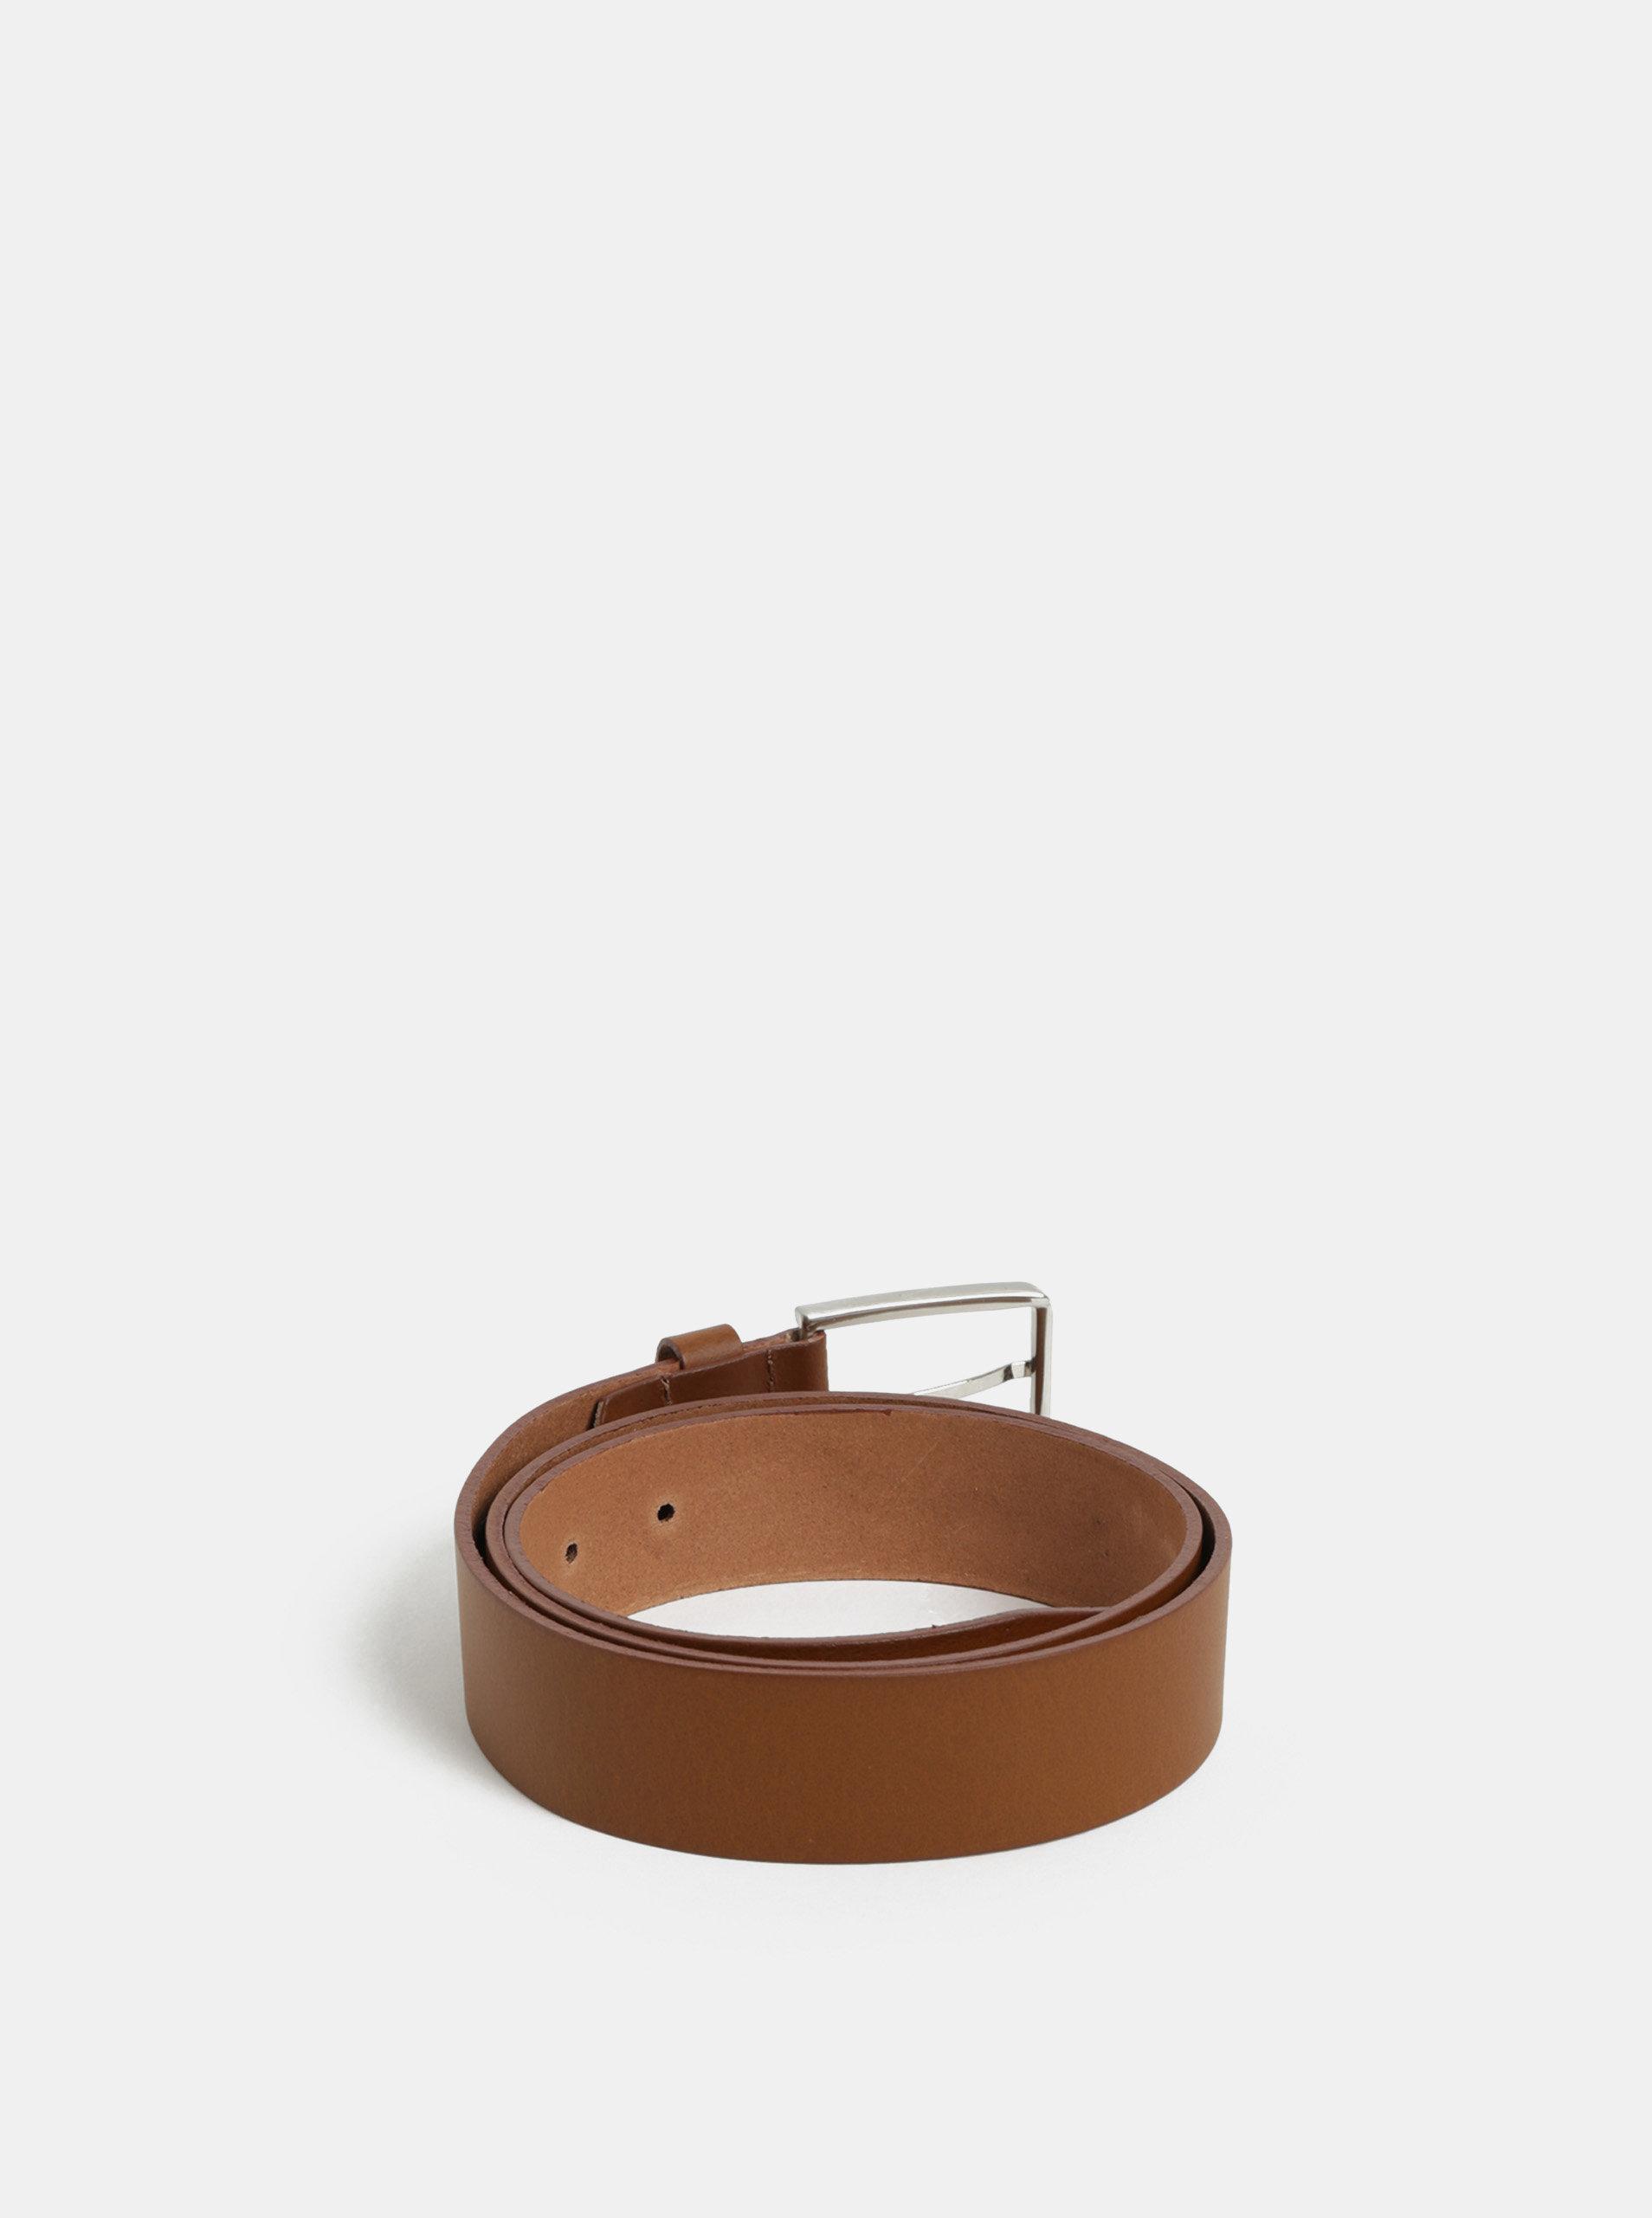 Hnedý pánsky kožený opasok Tommy HIlfiger ... 649979bf821